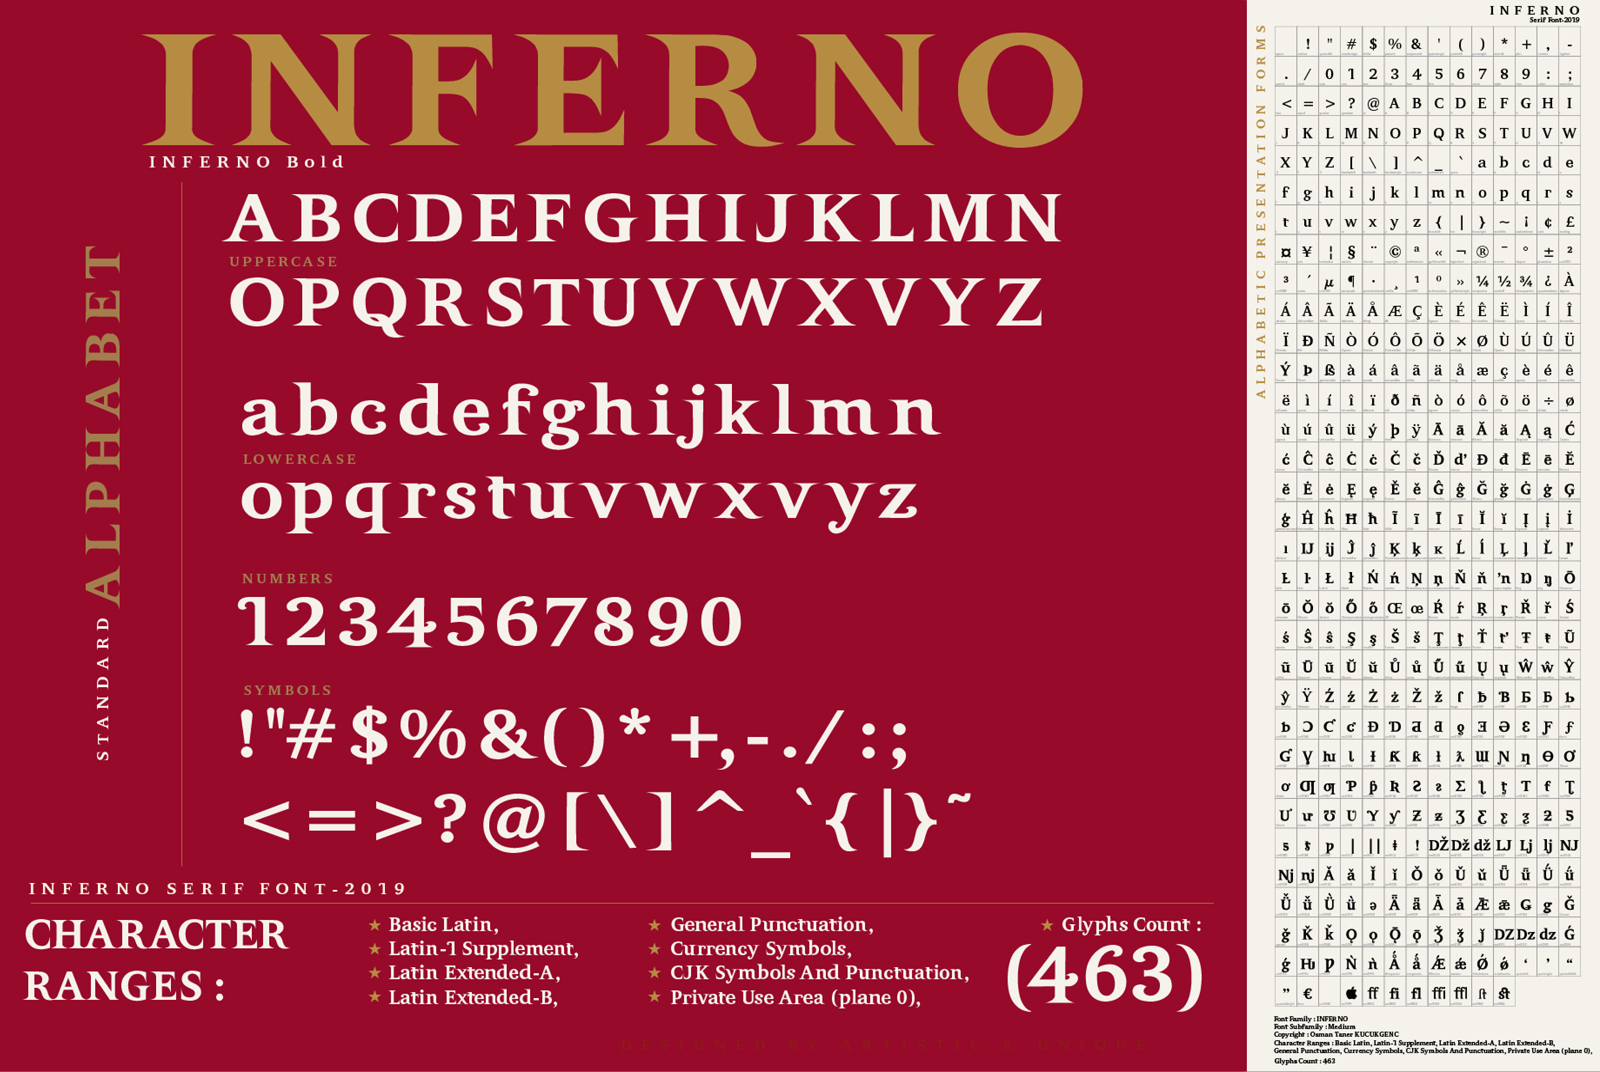 INFERNO Serif font example image 3